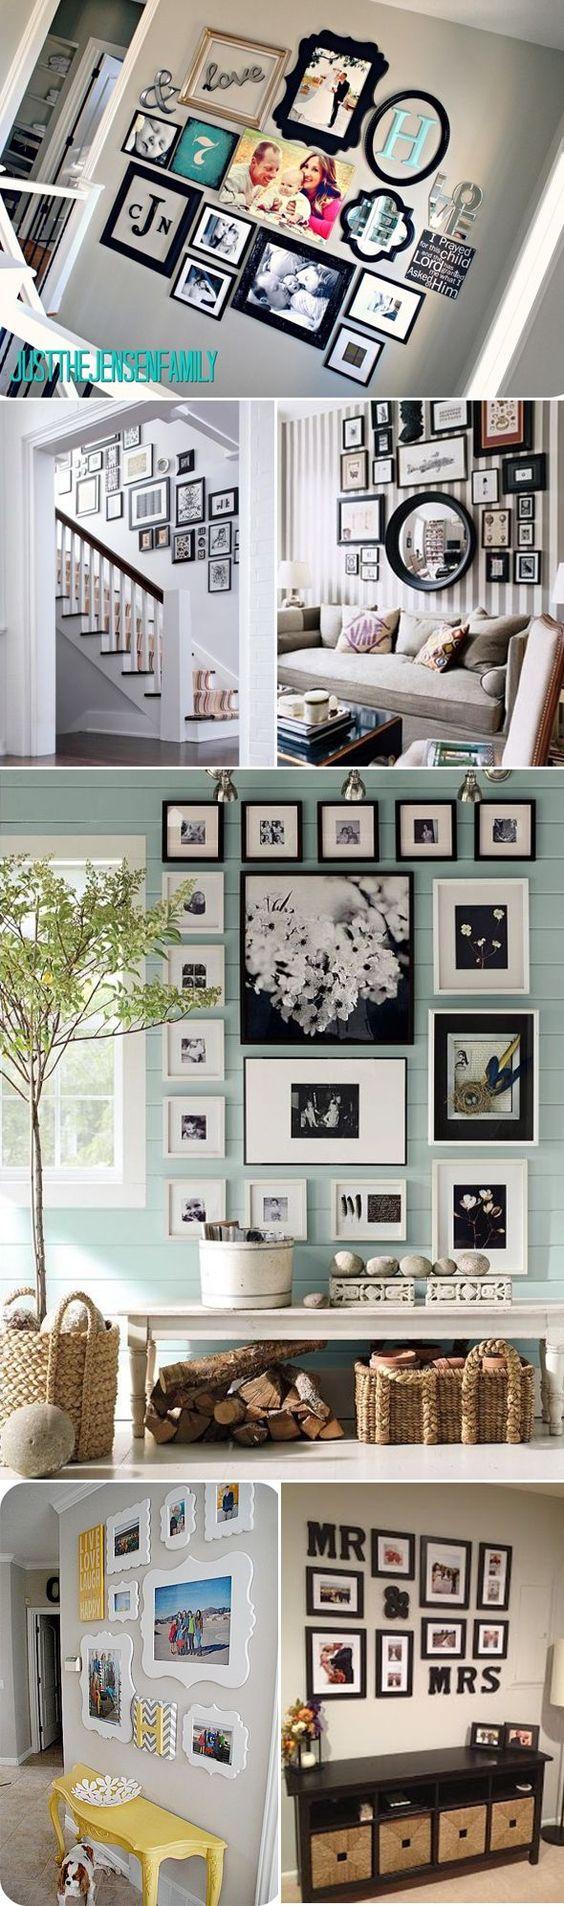 Gallery walls - elegant decor